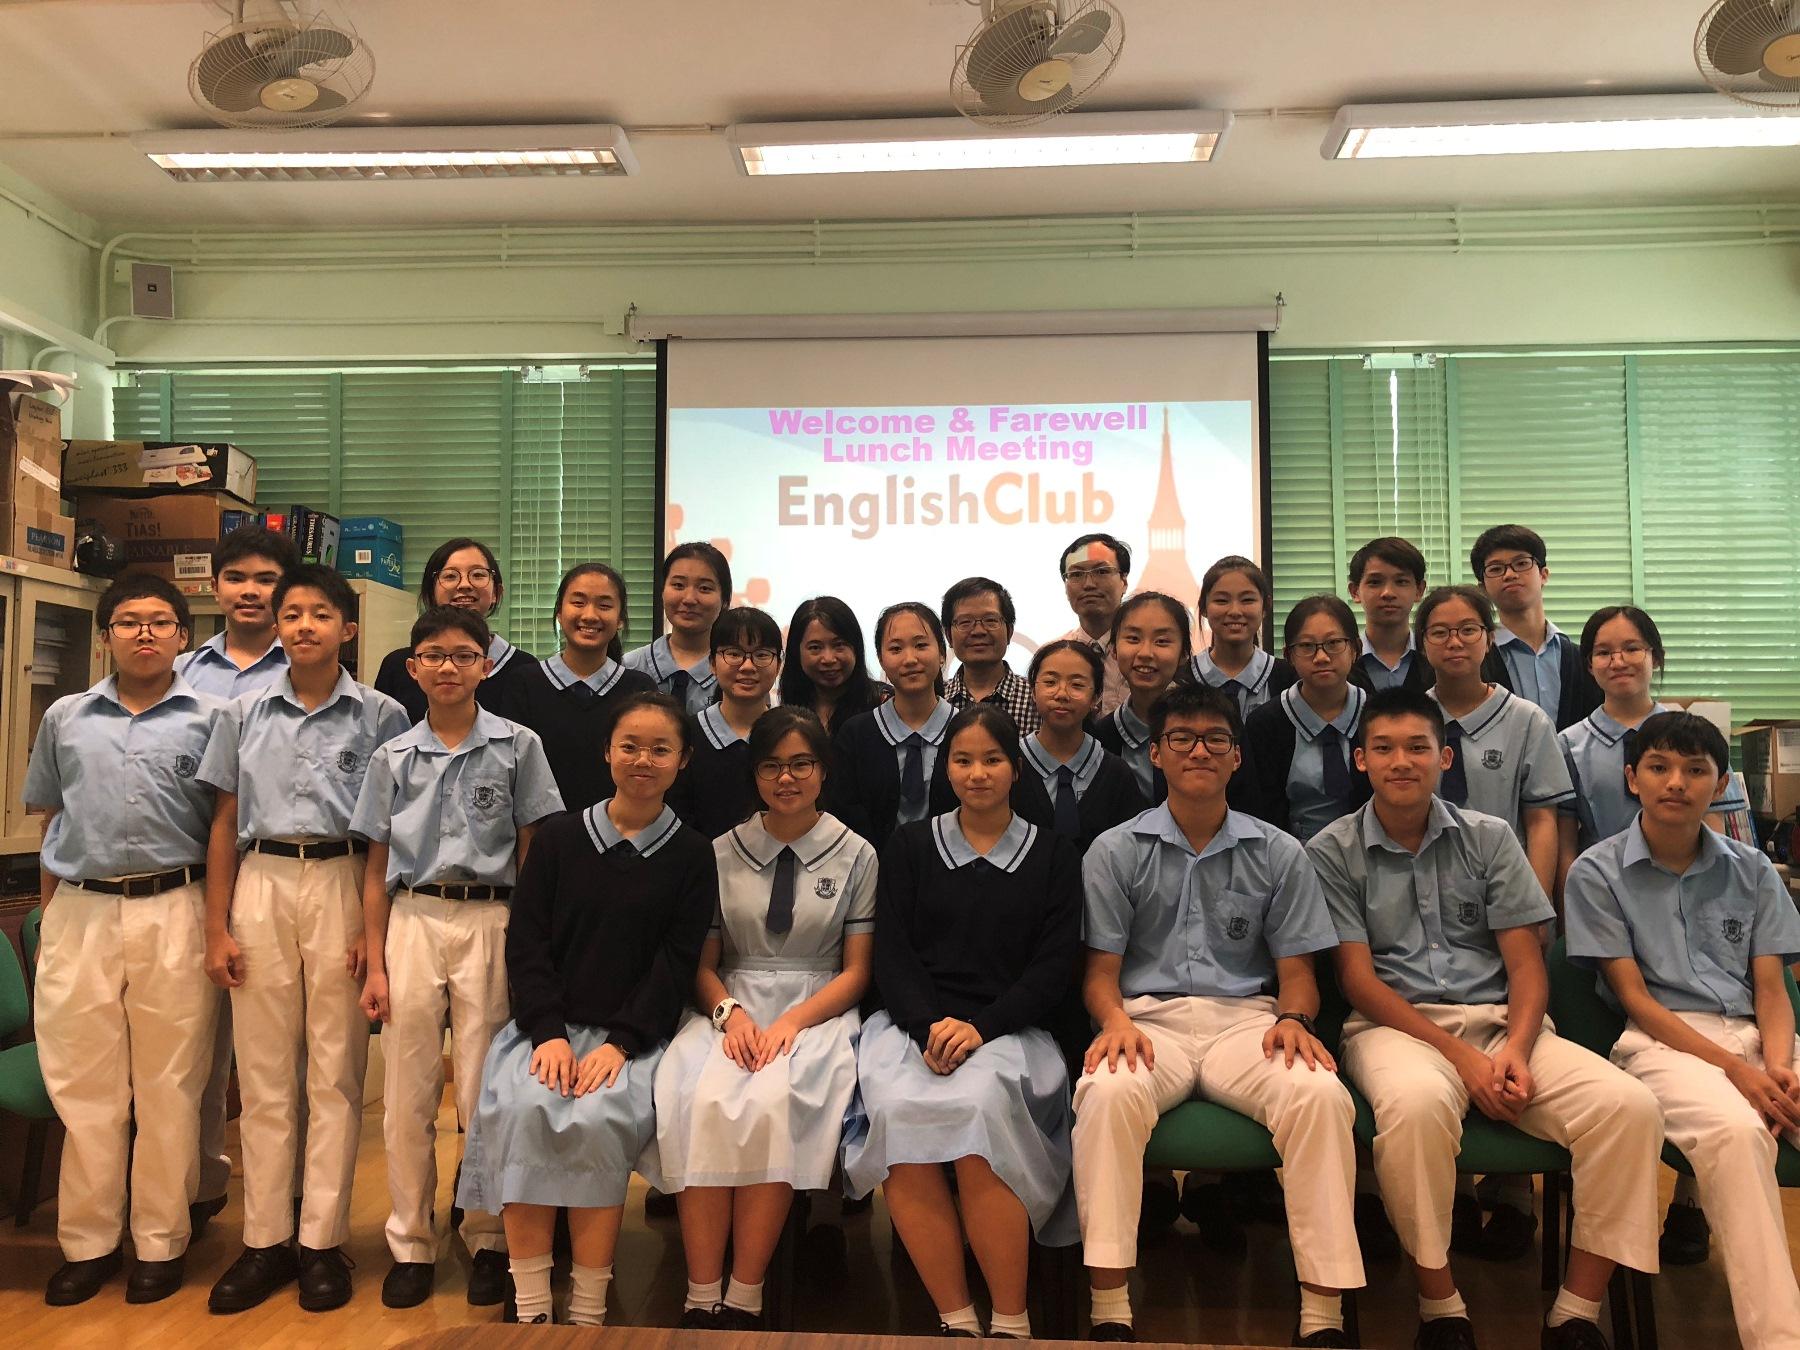 http://npc.edu.hk/sites/default/files/img_5156_1.jpg